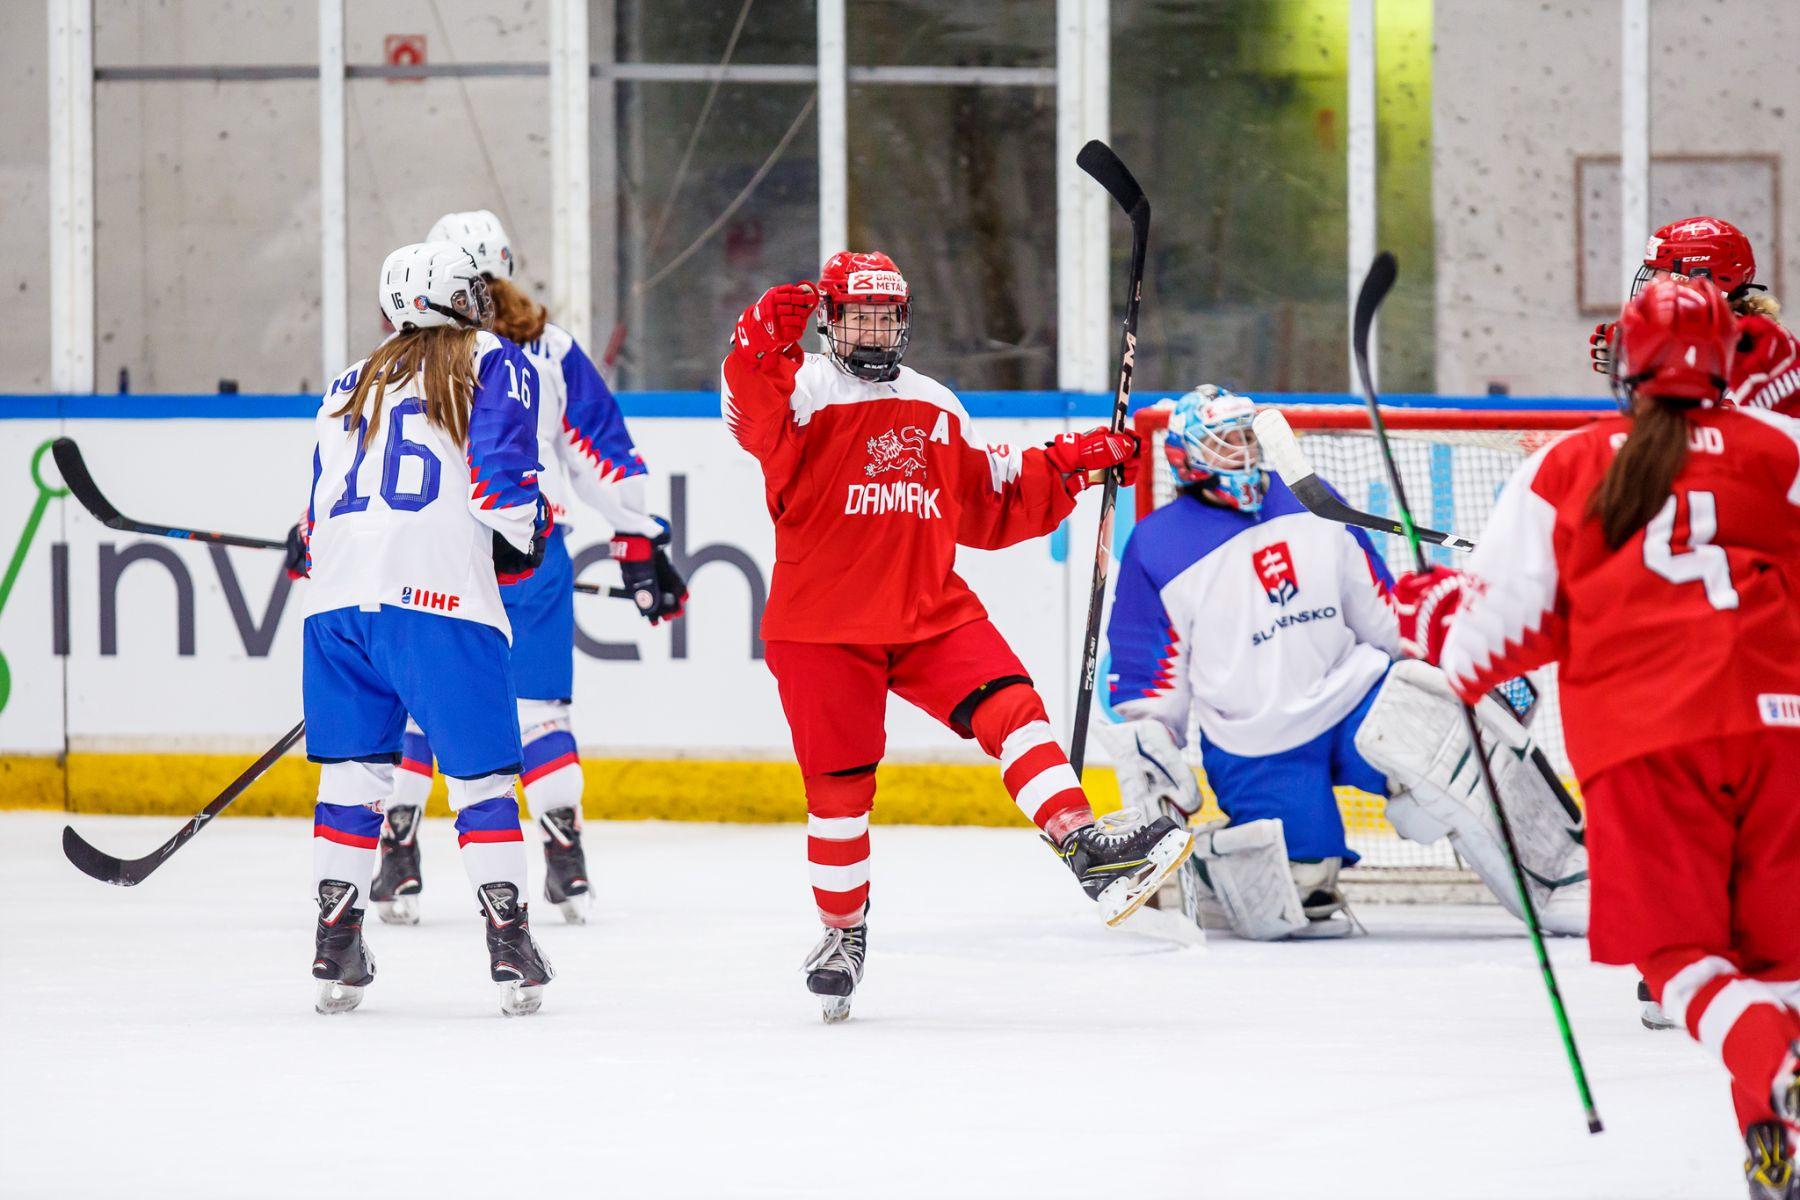 IIHF - Gallery: 2019 IIHF Ice Hockey Women's World Championship ...